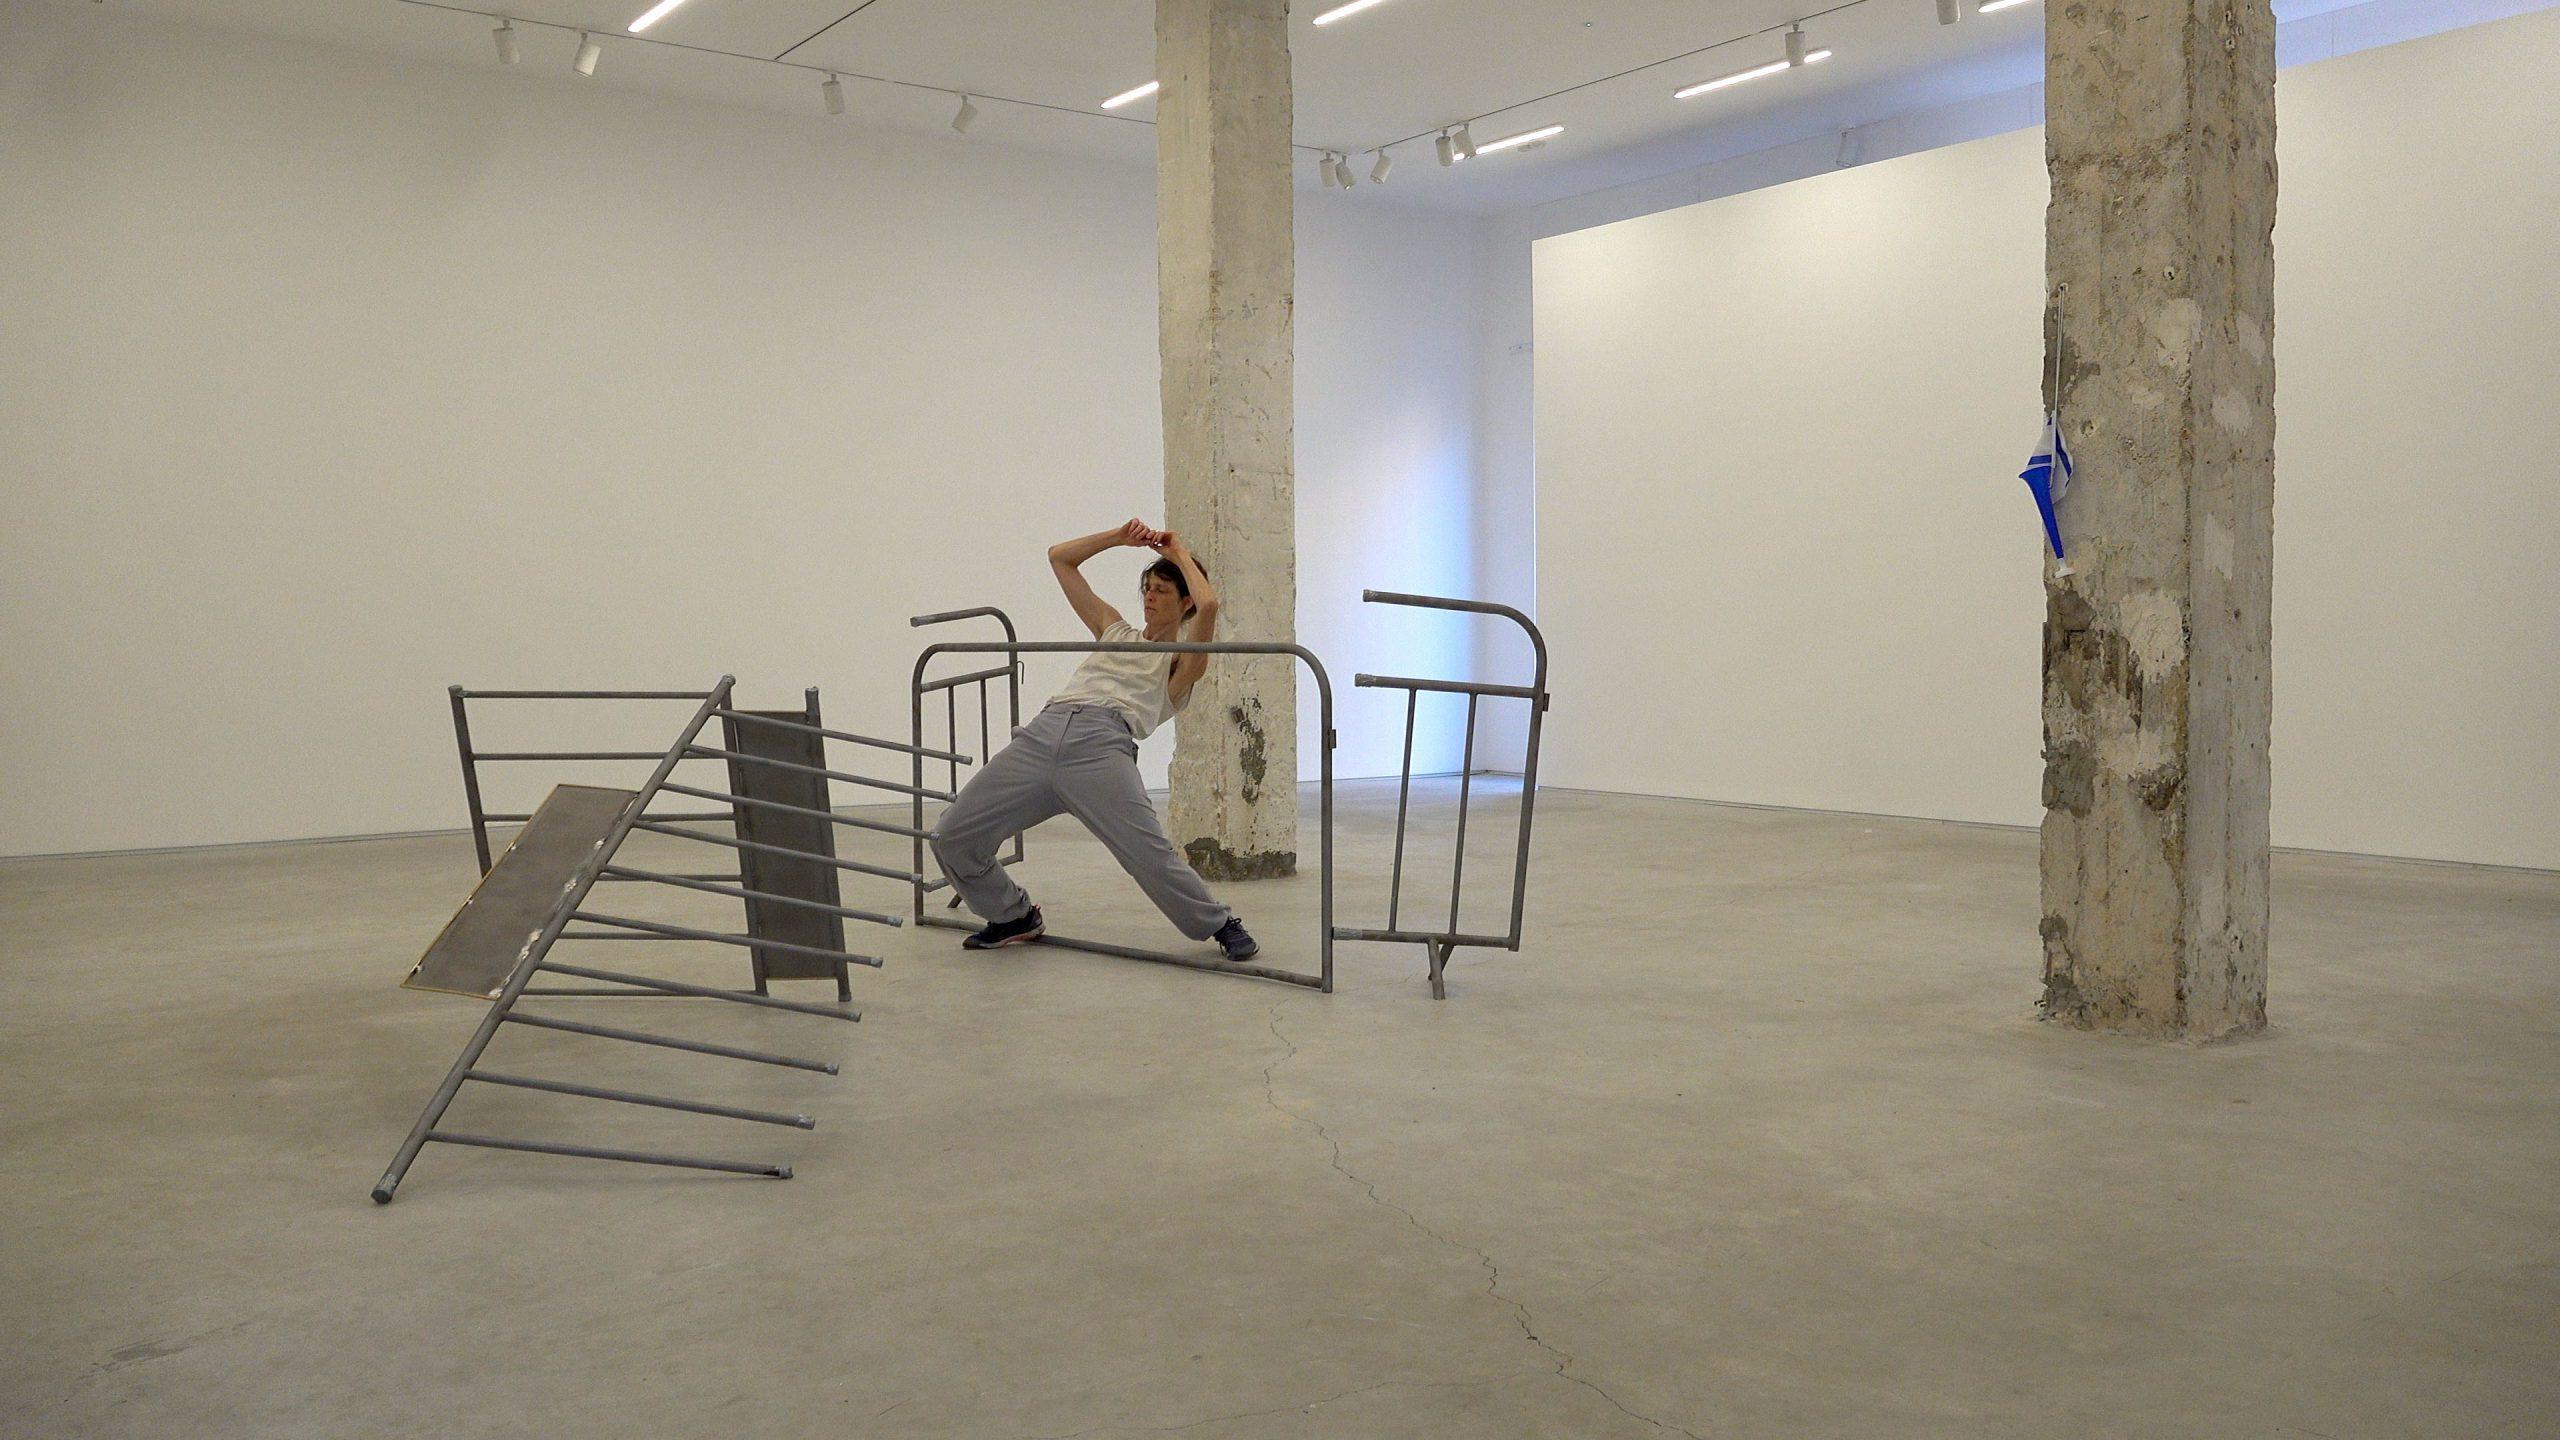 Nira Pereg Guardianess-of-the-Walls, still from video 2021